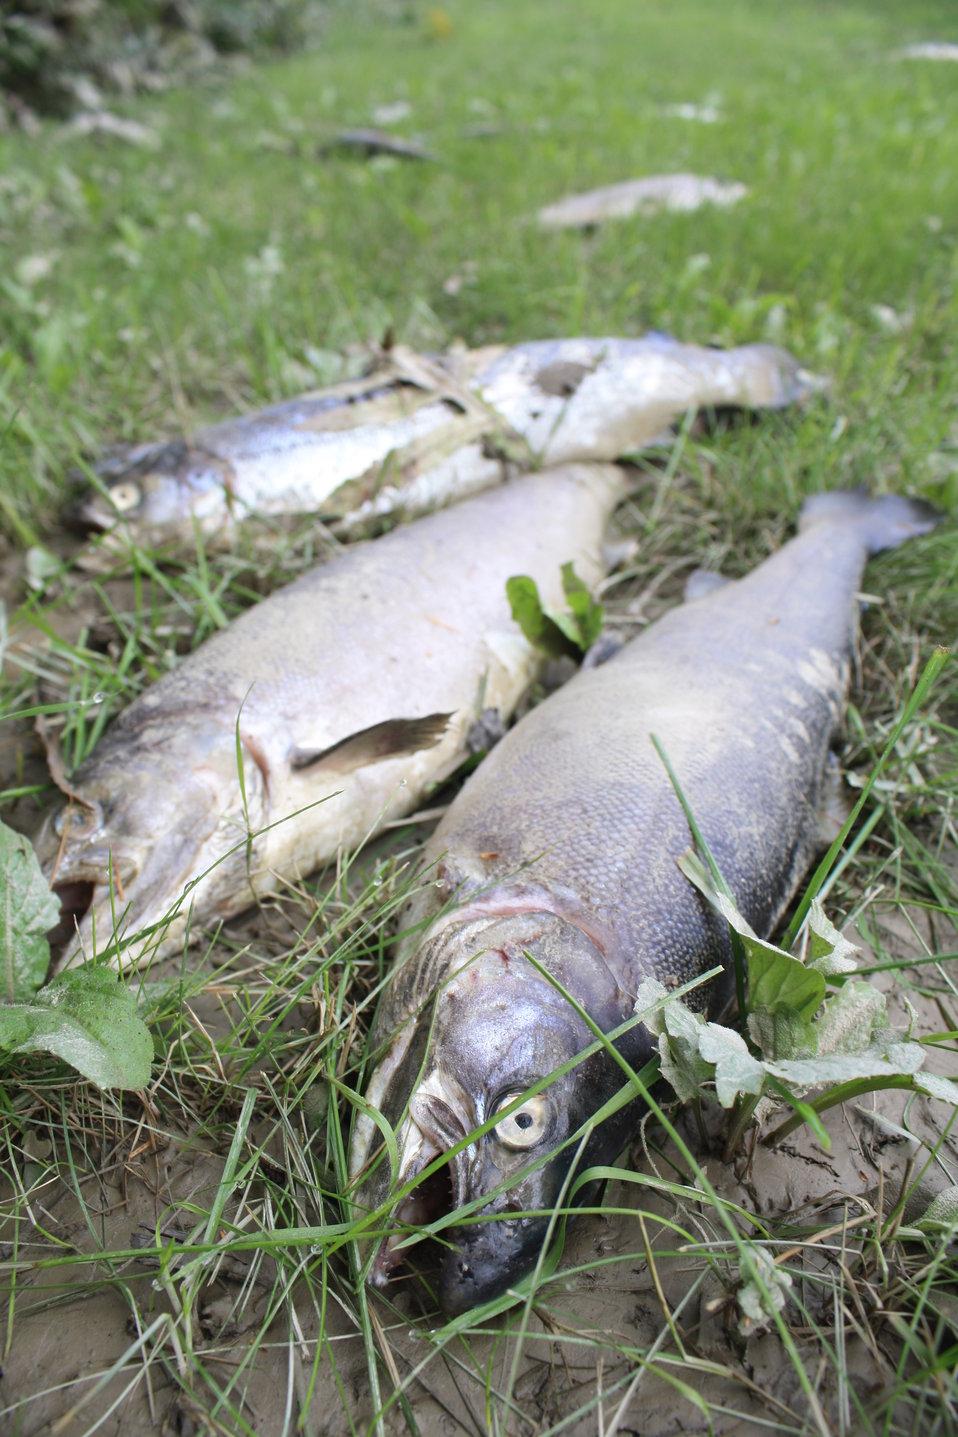 Dead fish after Hurricane Irene flood event